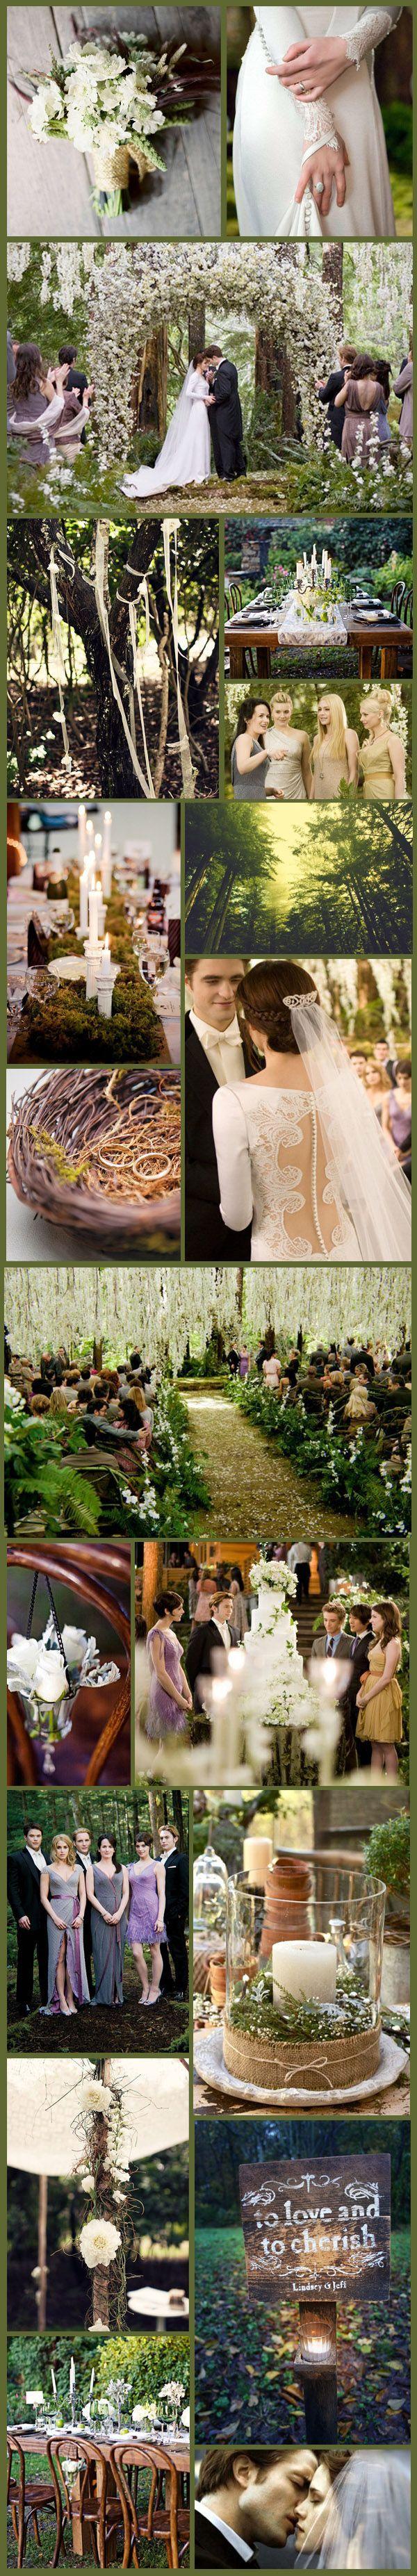 Wednesday Wedding Inspiration: Twilight Time